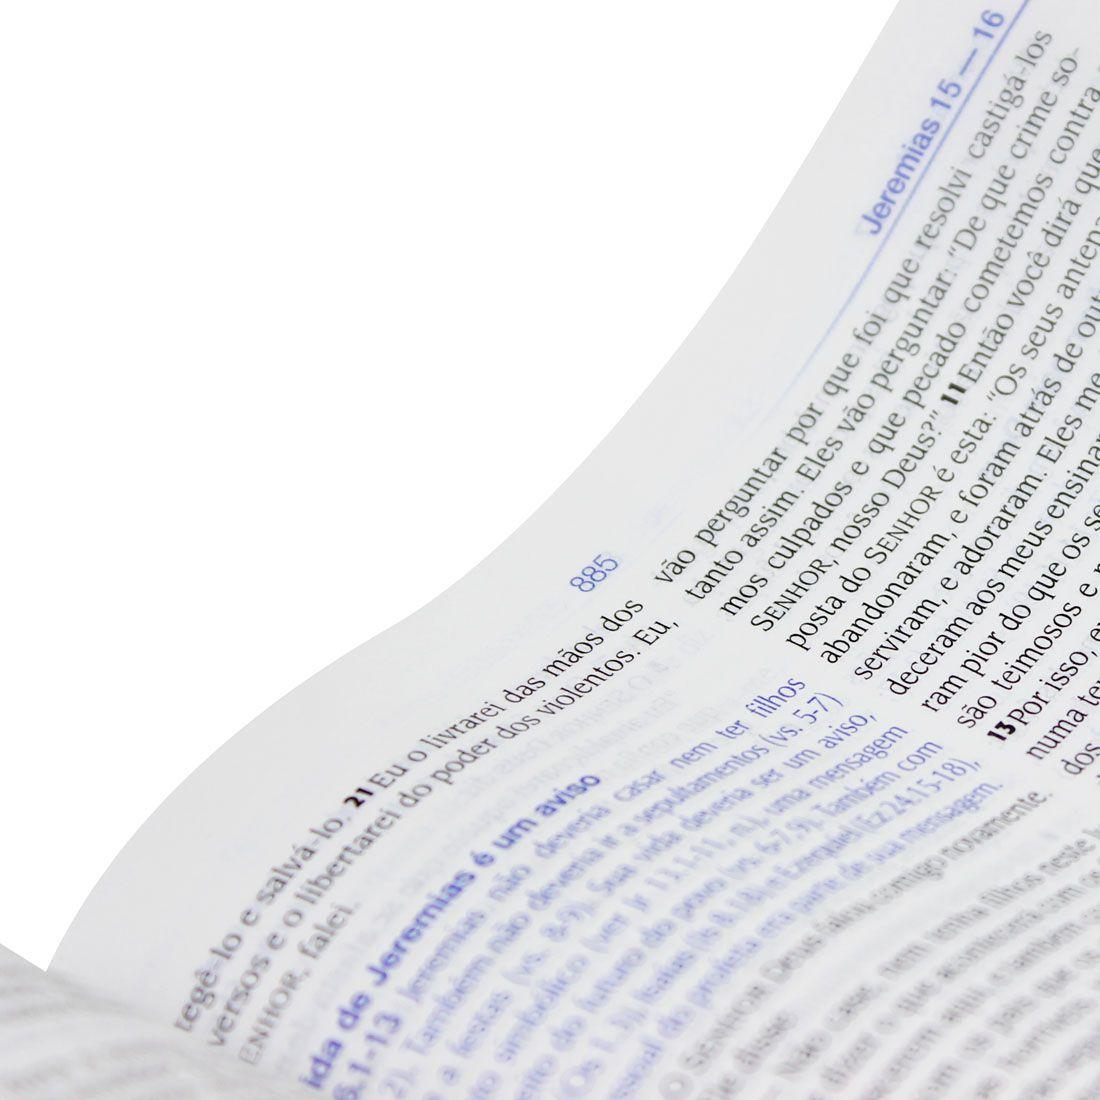 Bíblia de Estudo NTLH Média - Sbb  - Universo Bíblico Rs